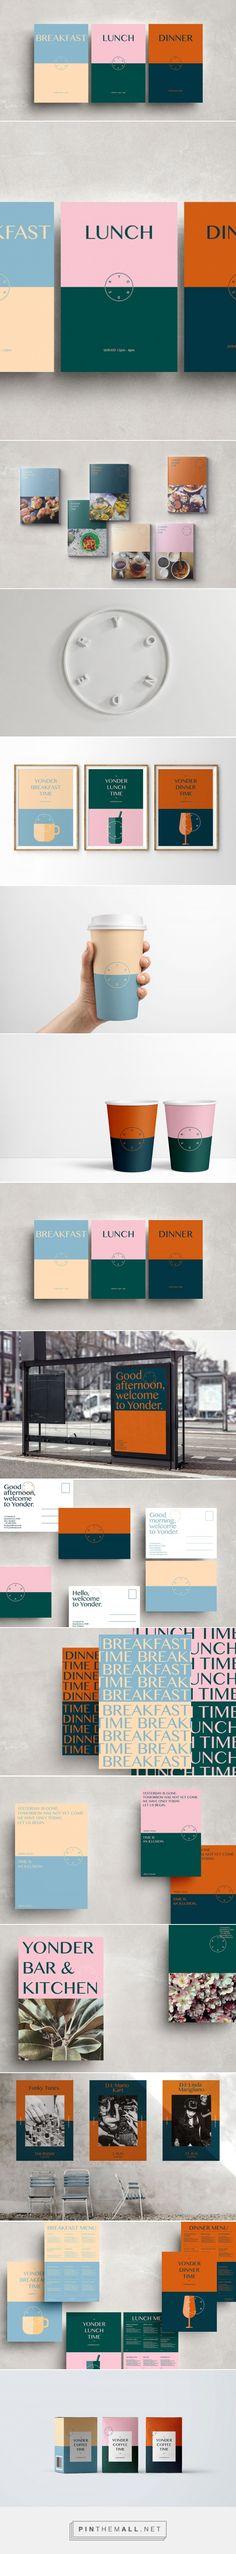 Yonder Time Branding - Mindsparkle Mag - created via https://pinthemall.net